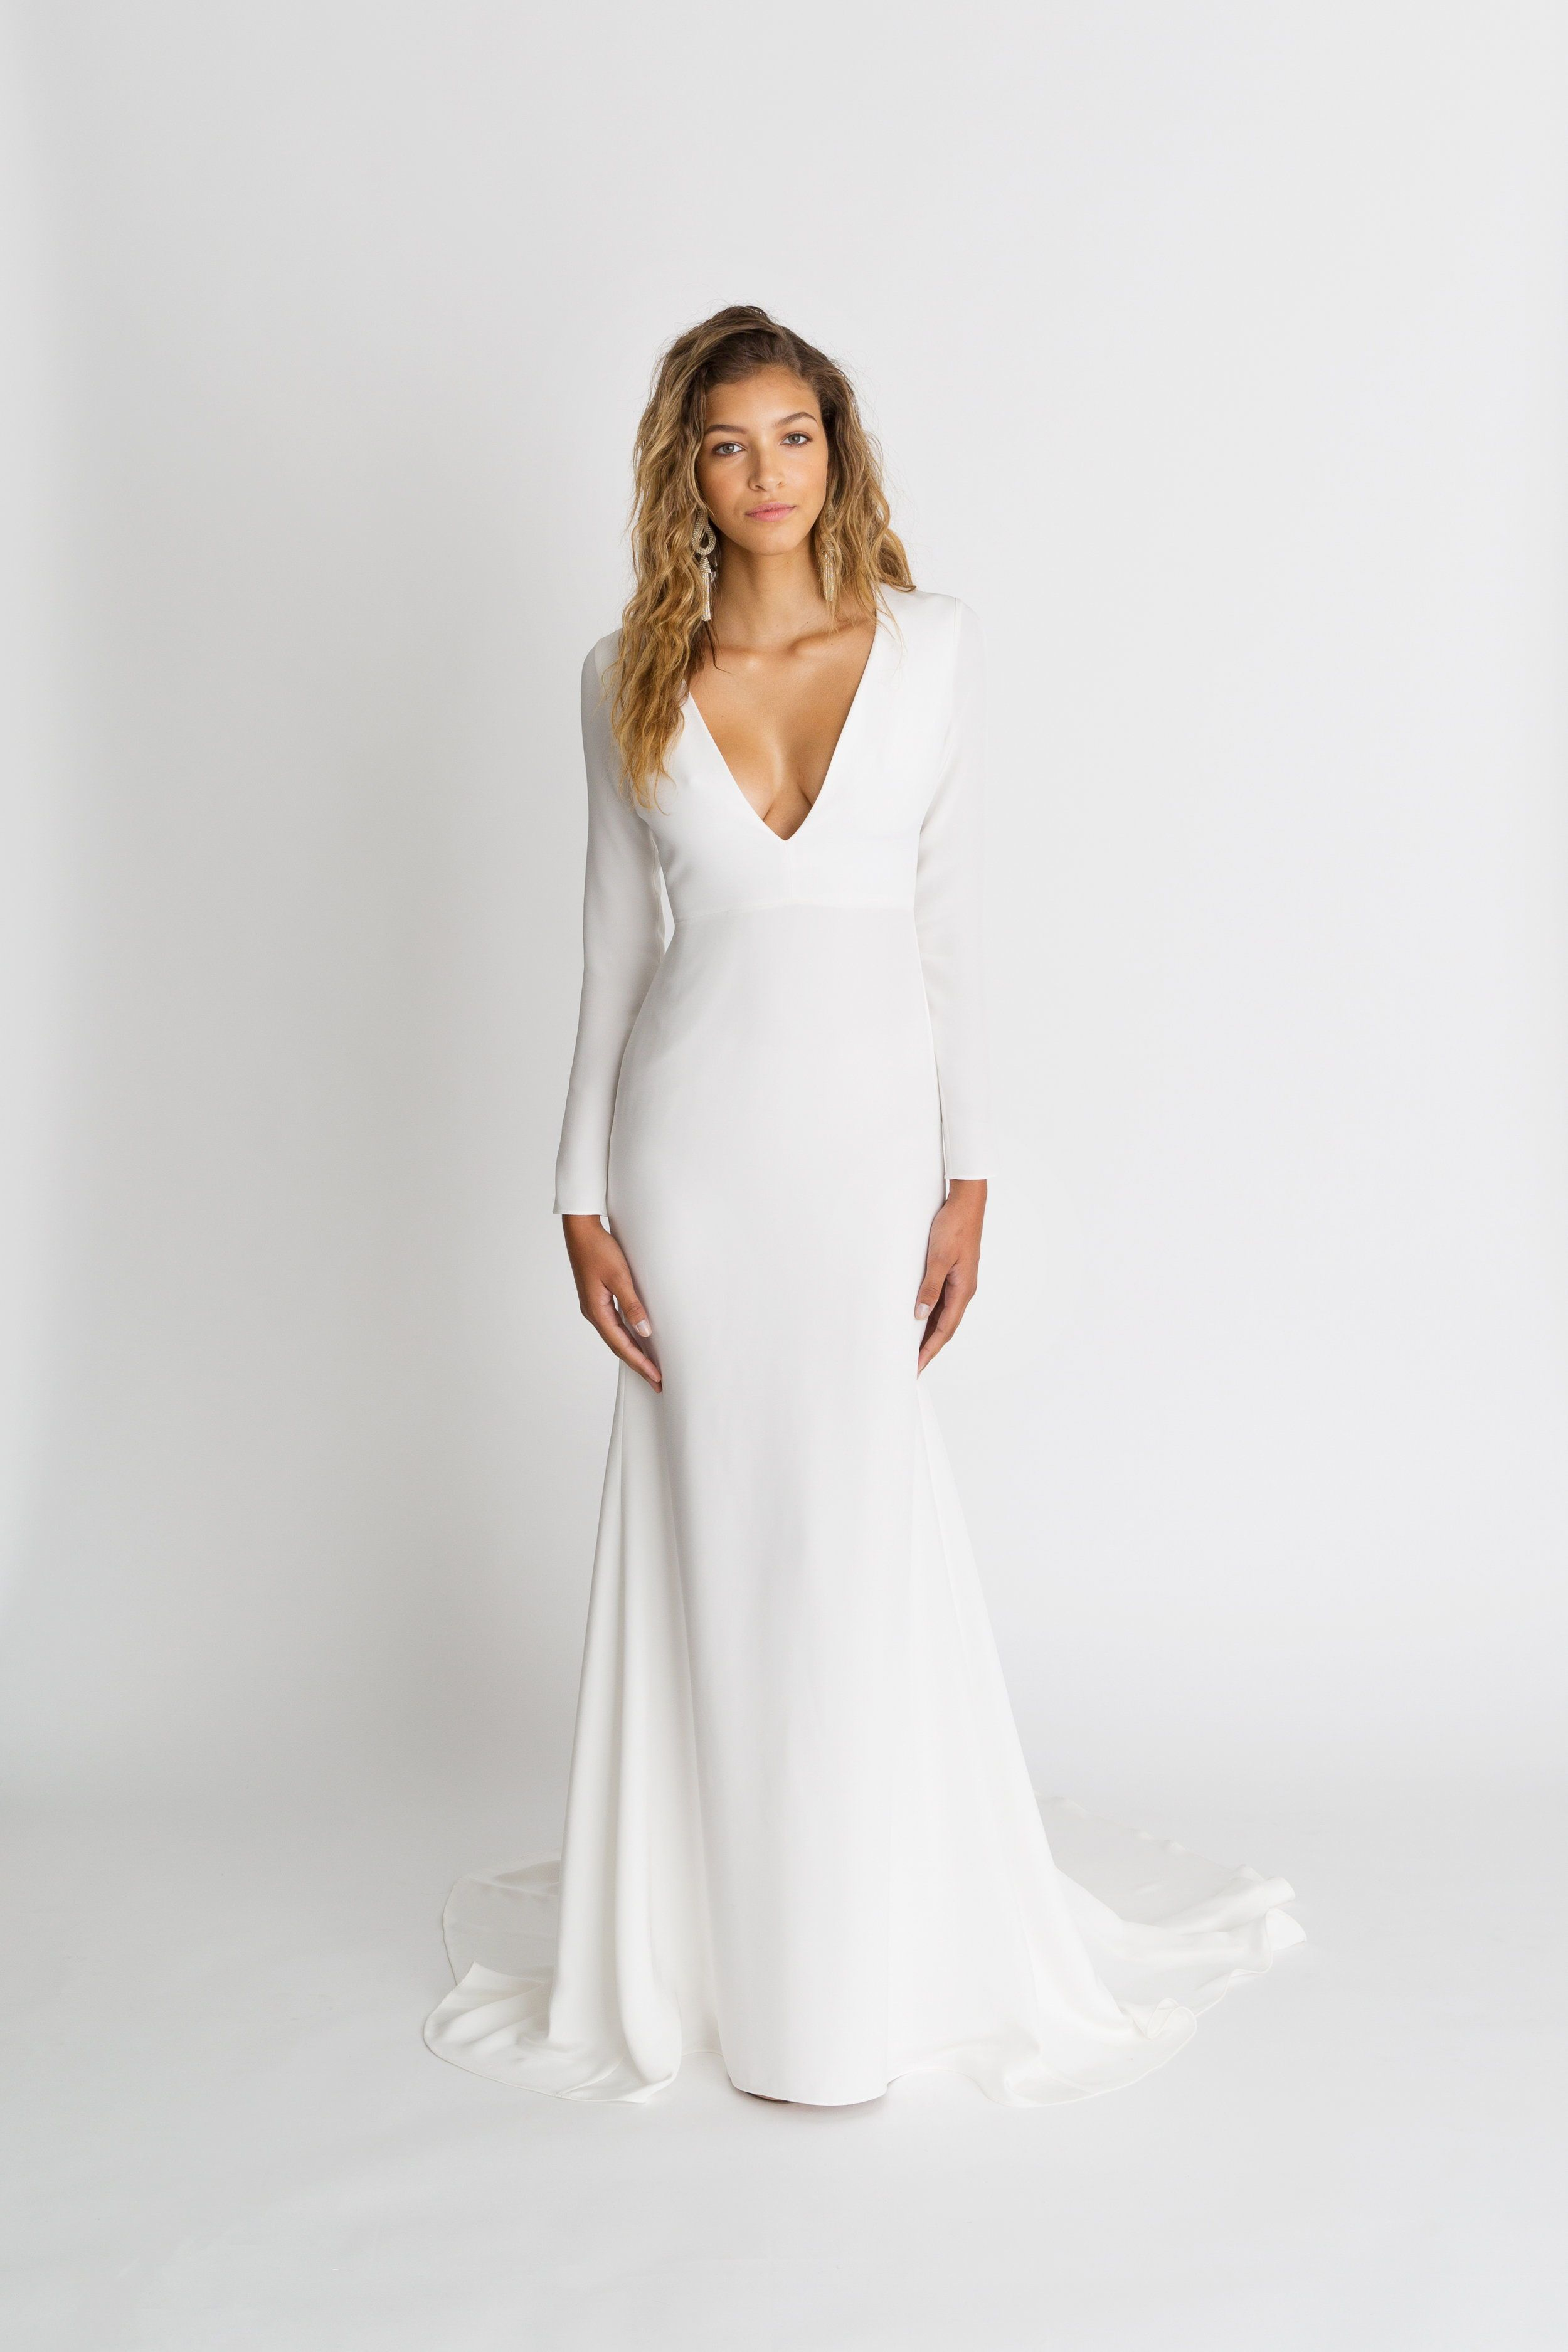 Celine By Alexandra Grecco Magic Hour Collection The Celine Gown Is A Sleek Silk Crepe Style Wedding Dress Long Sleeve Modern Wedding Dress Wedding Dresses